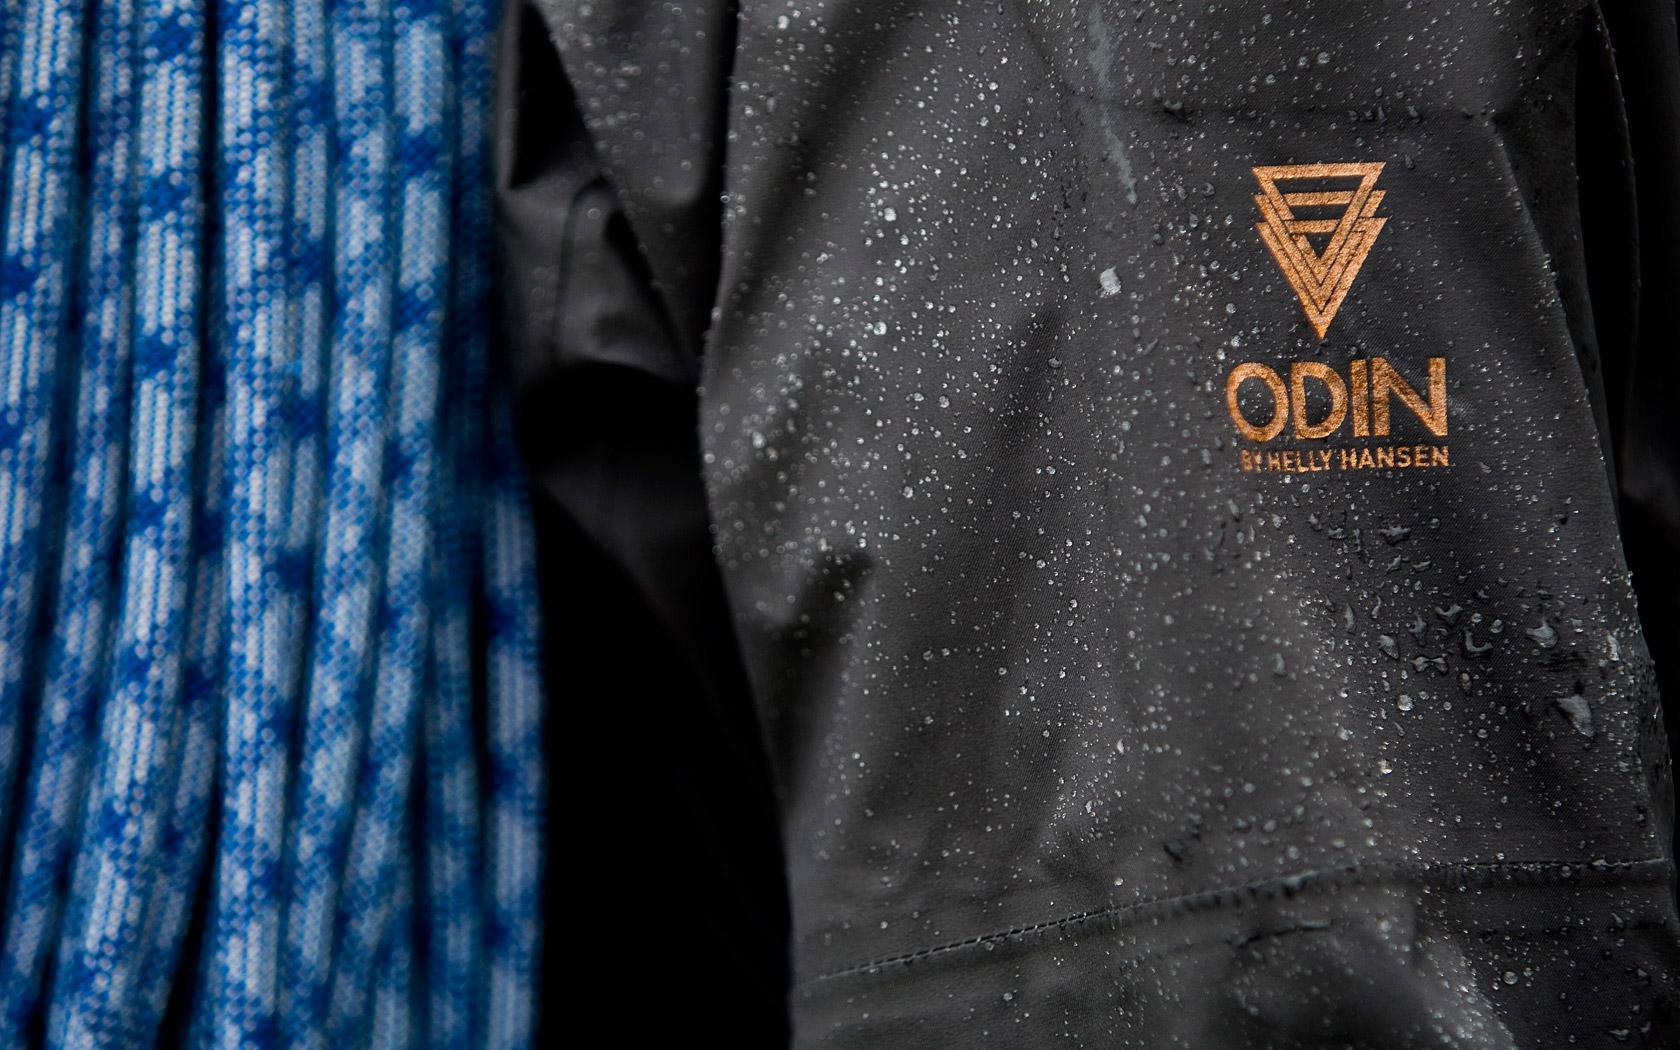 Odin-05.jpg